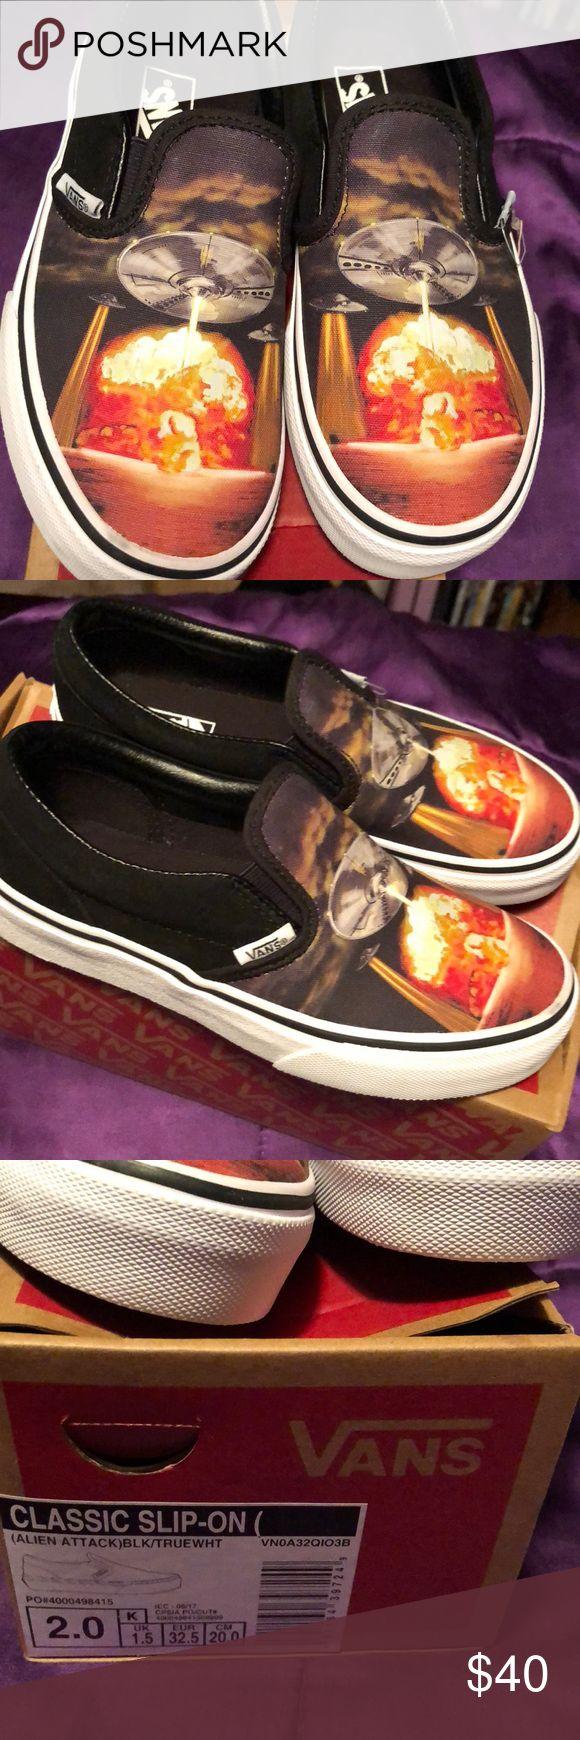 Boys Vans Slides Boys Vans Slides Shoes Sneakers